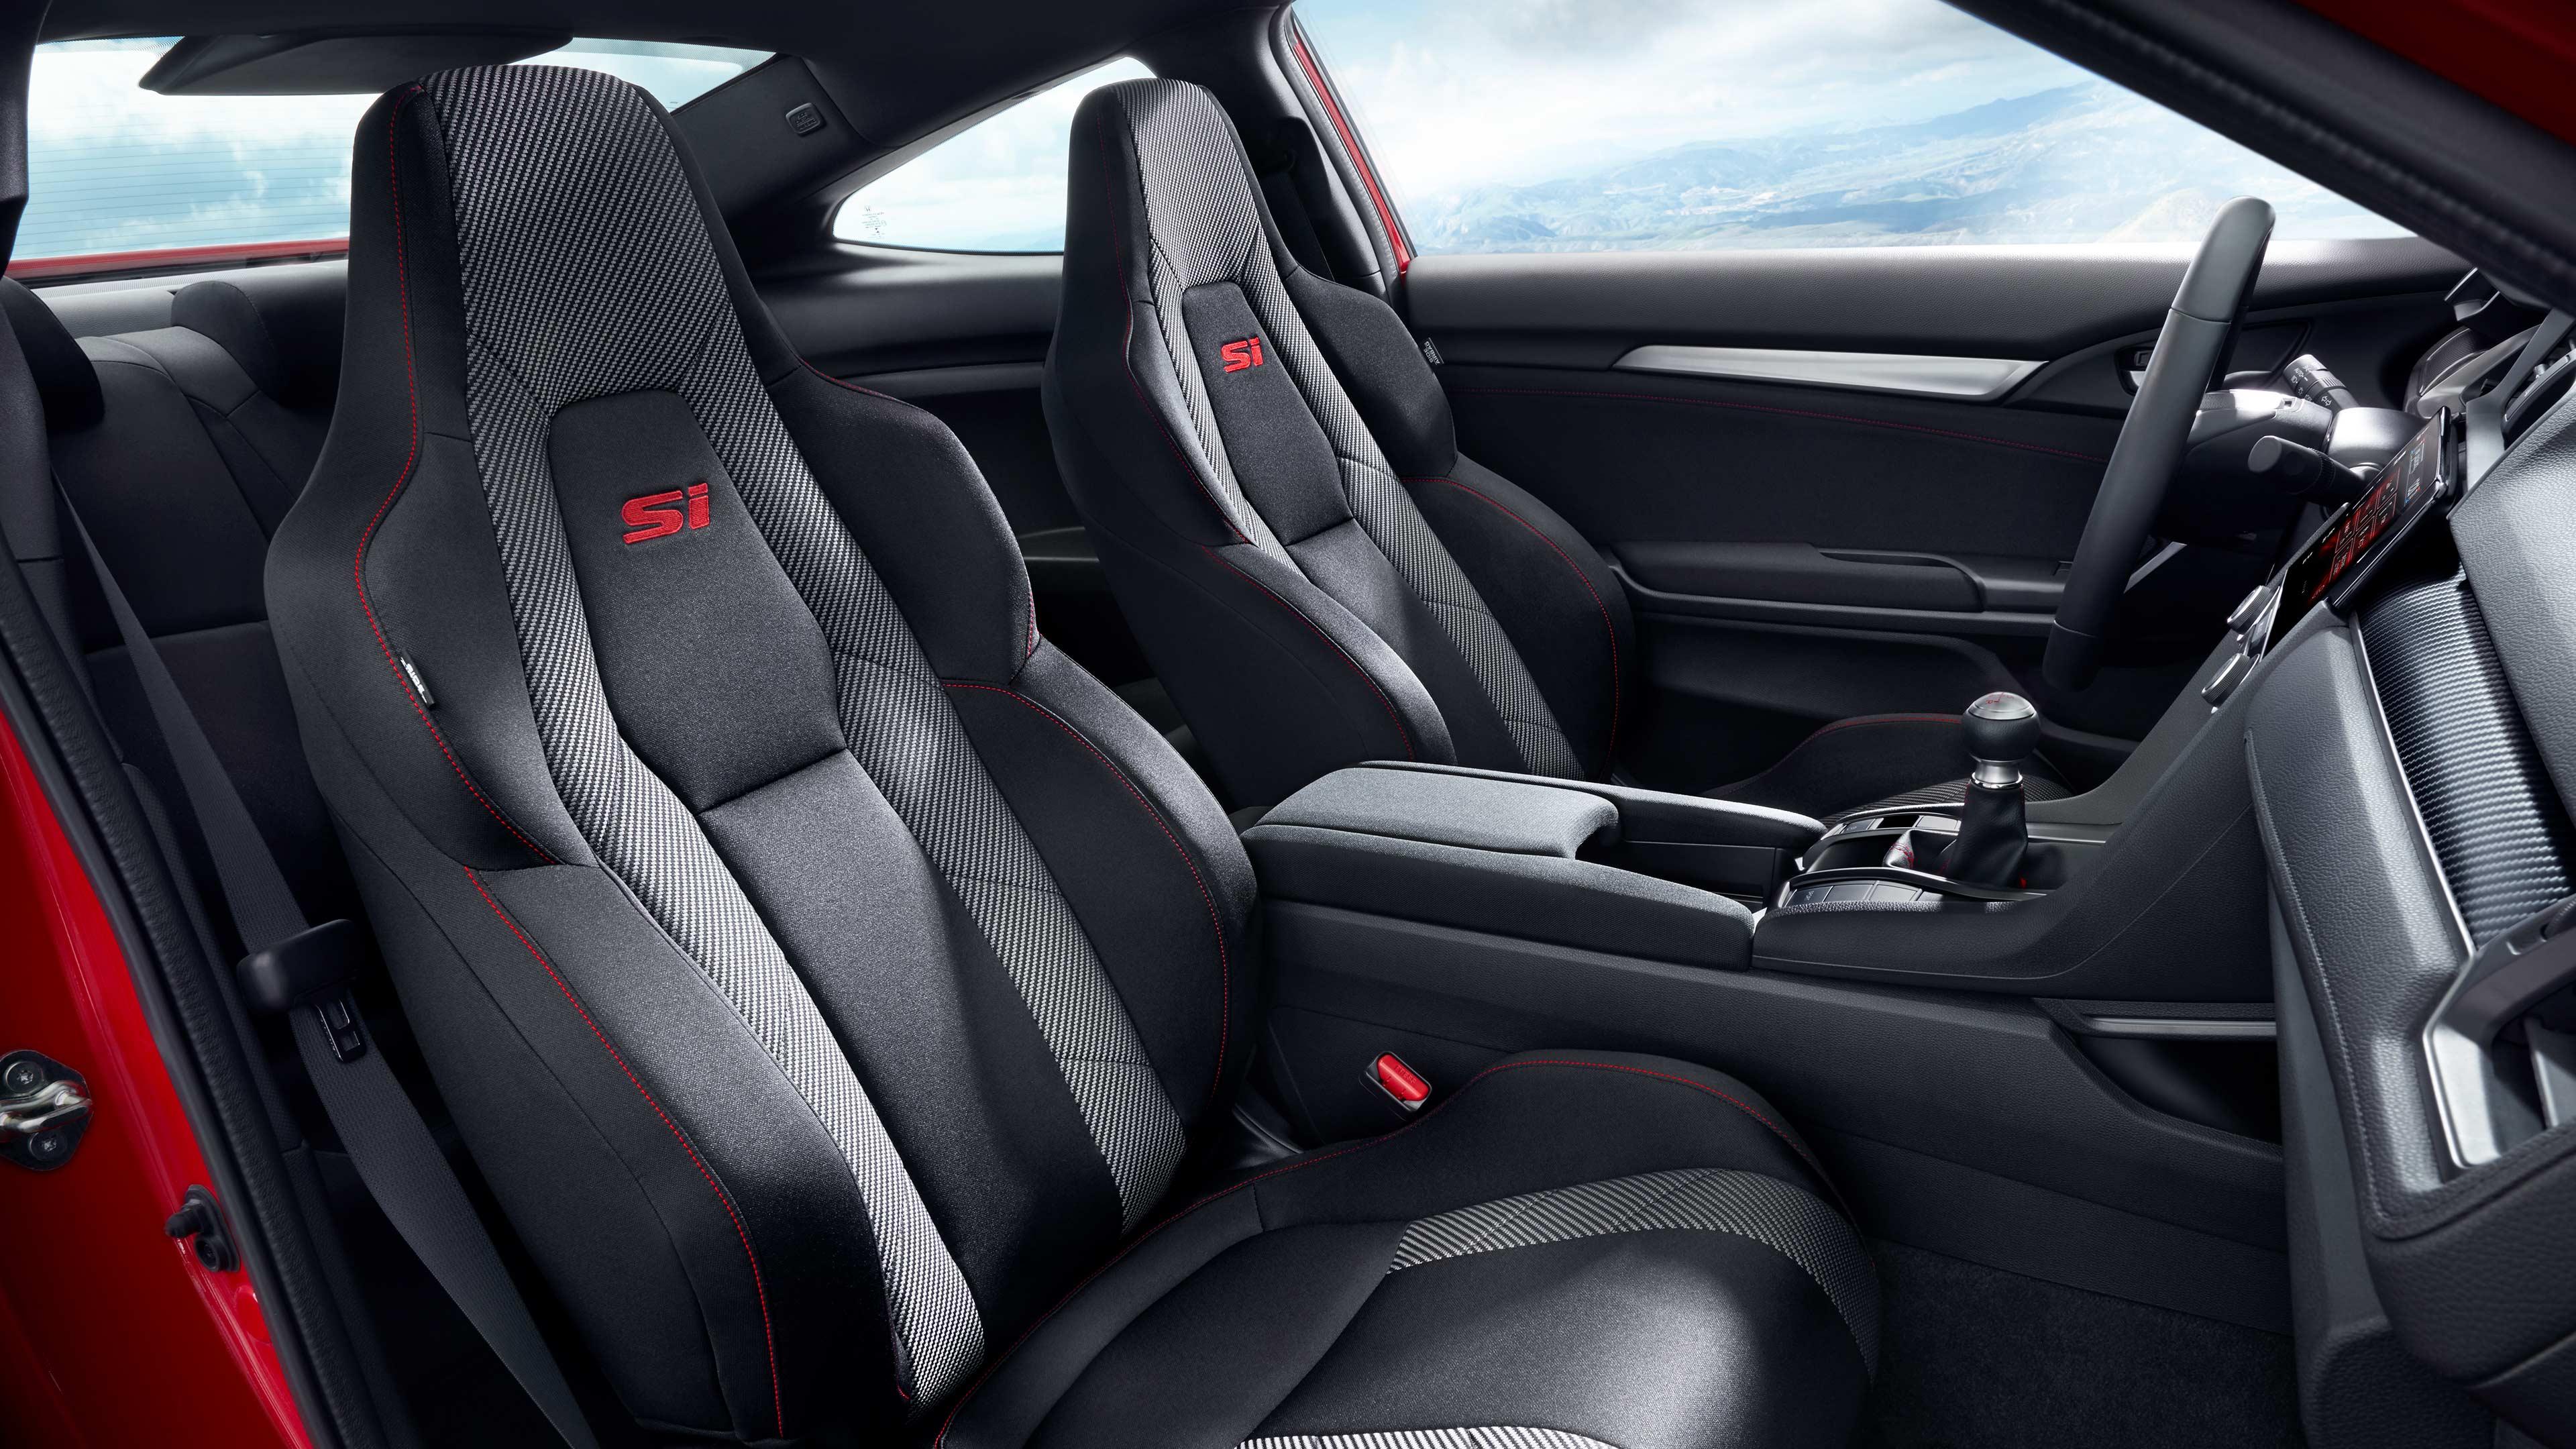 Civic Coupe Si Interior Shot